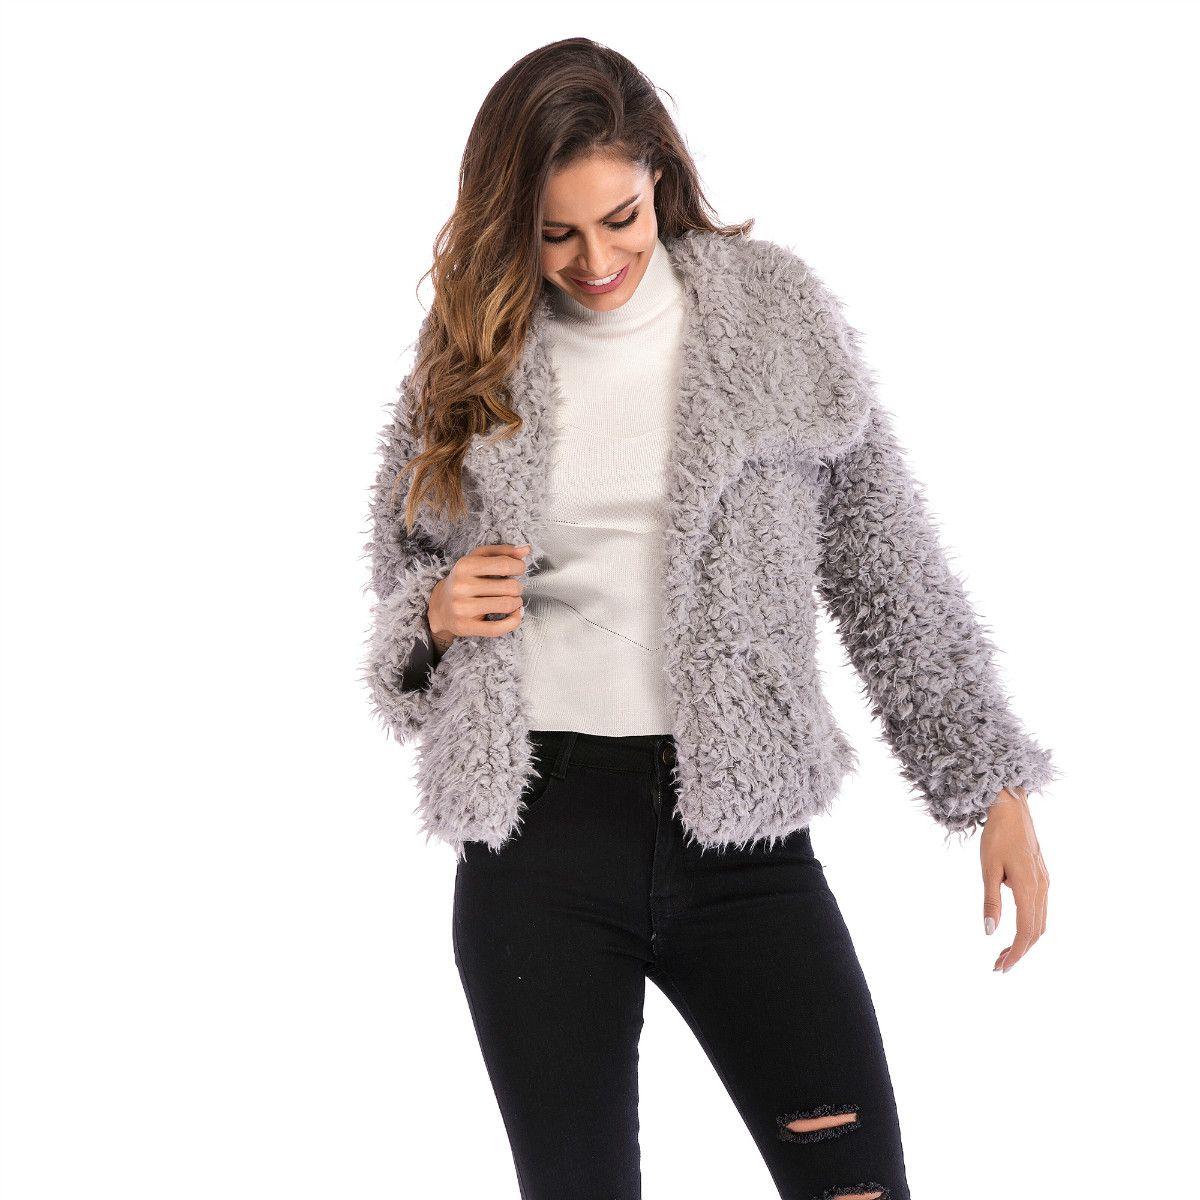 2b9ed67a47d 2018 Winter Lapel Furry Coat Solid Color Women Warm Fashion Jacket ...